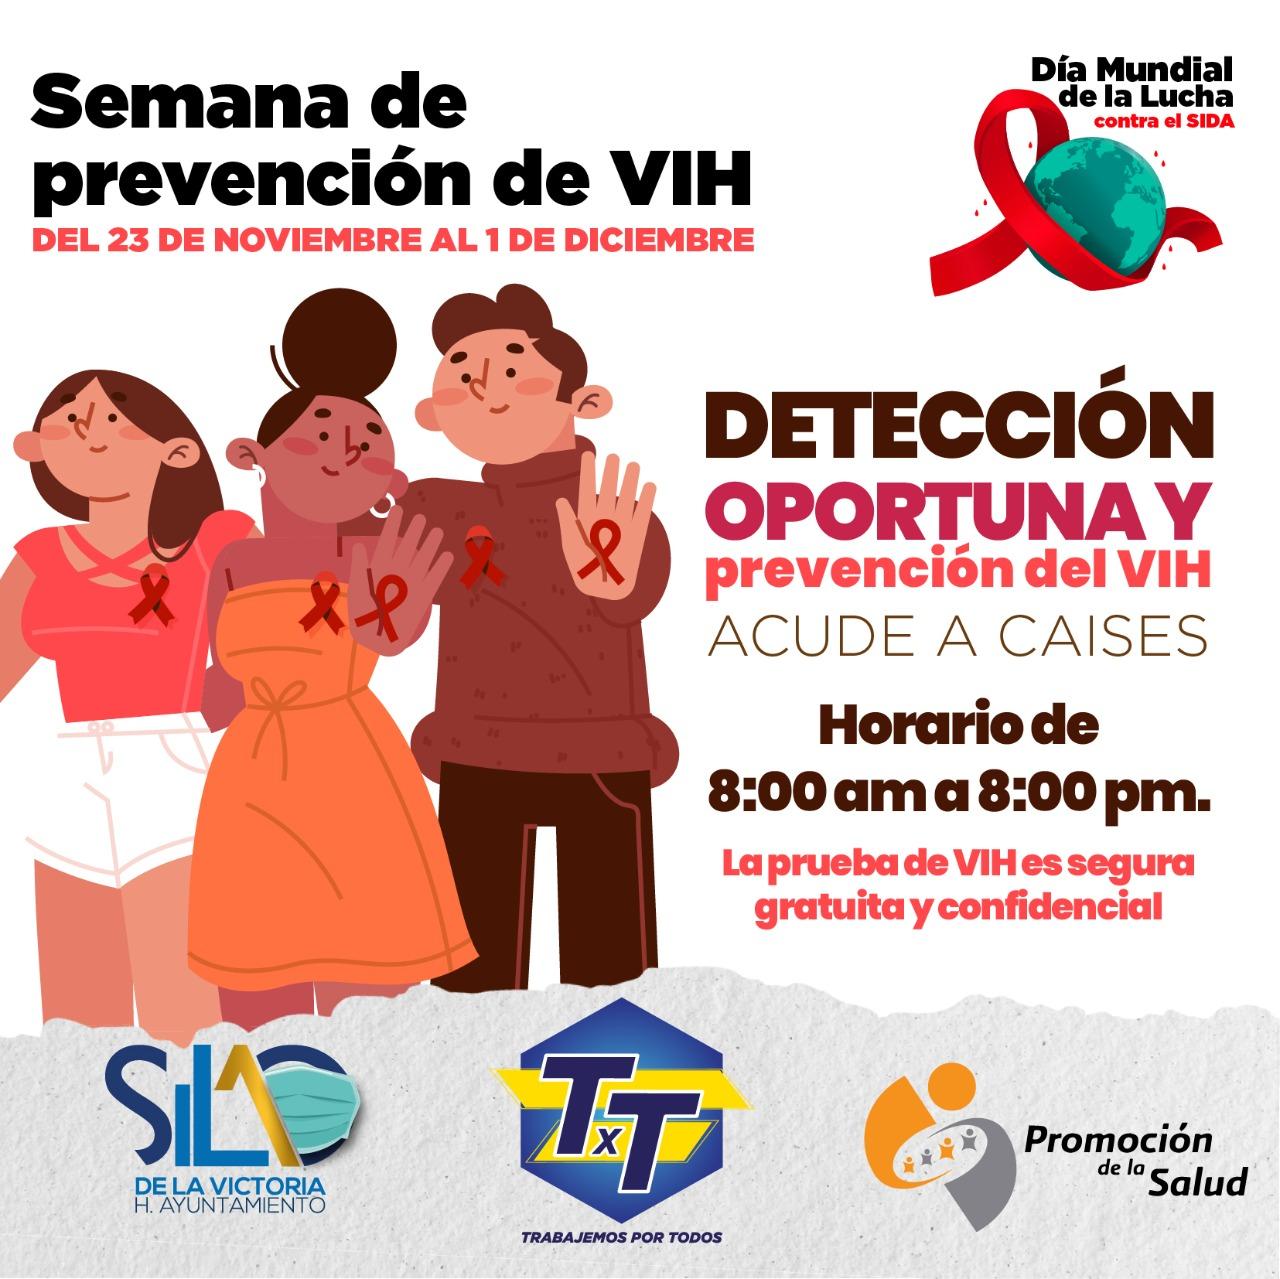 Invitan a realizar prueba gratuita de VIH